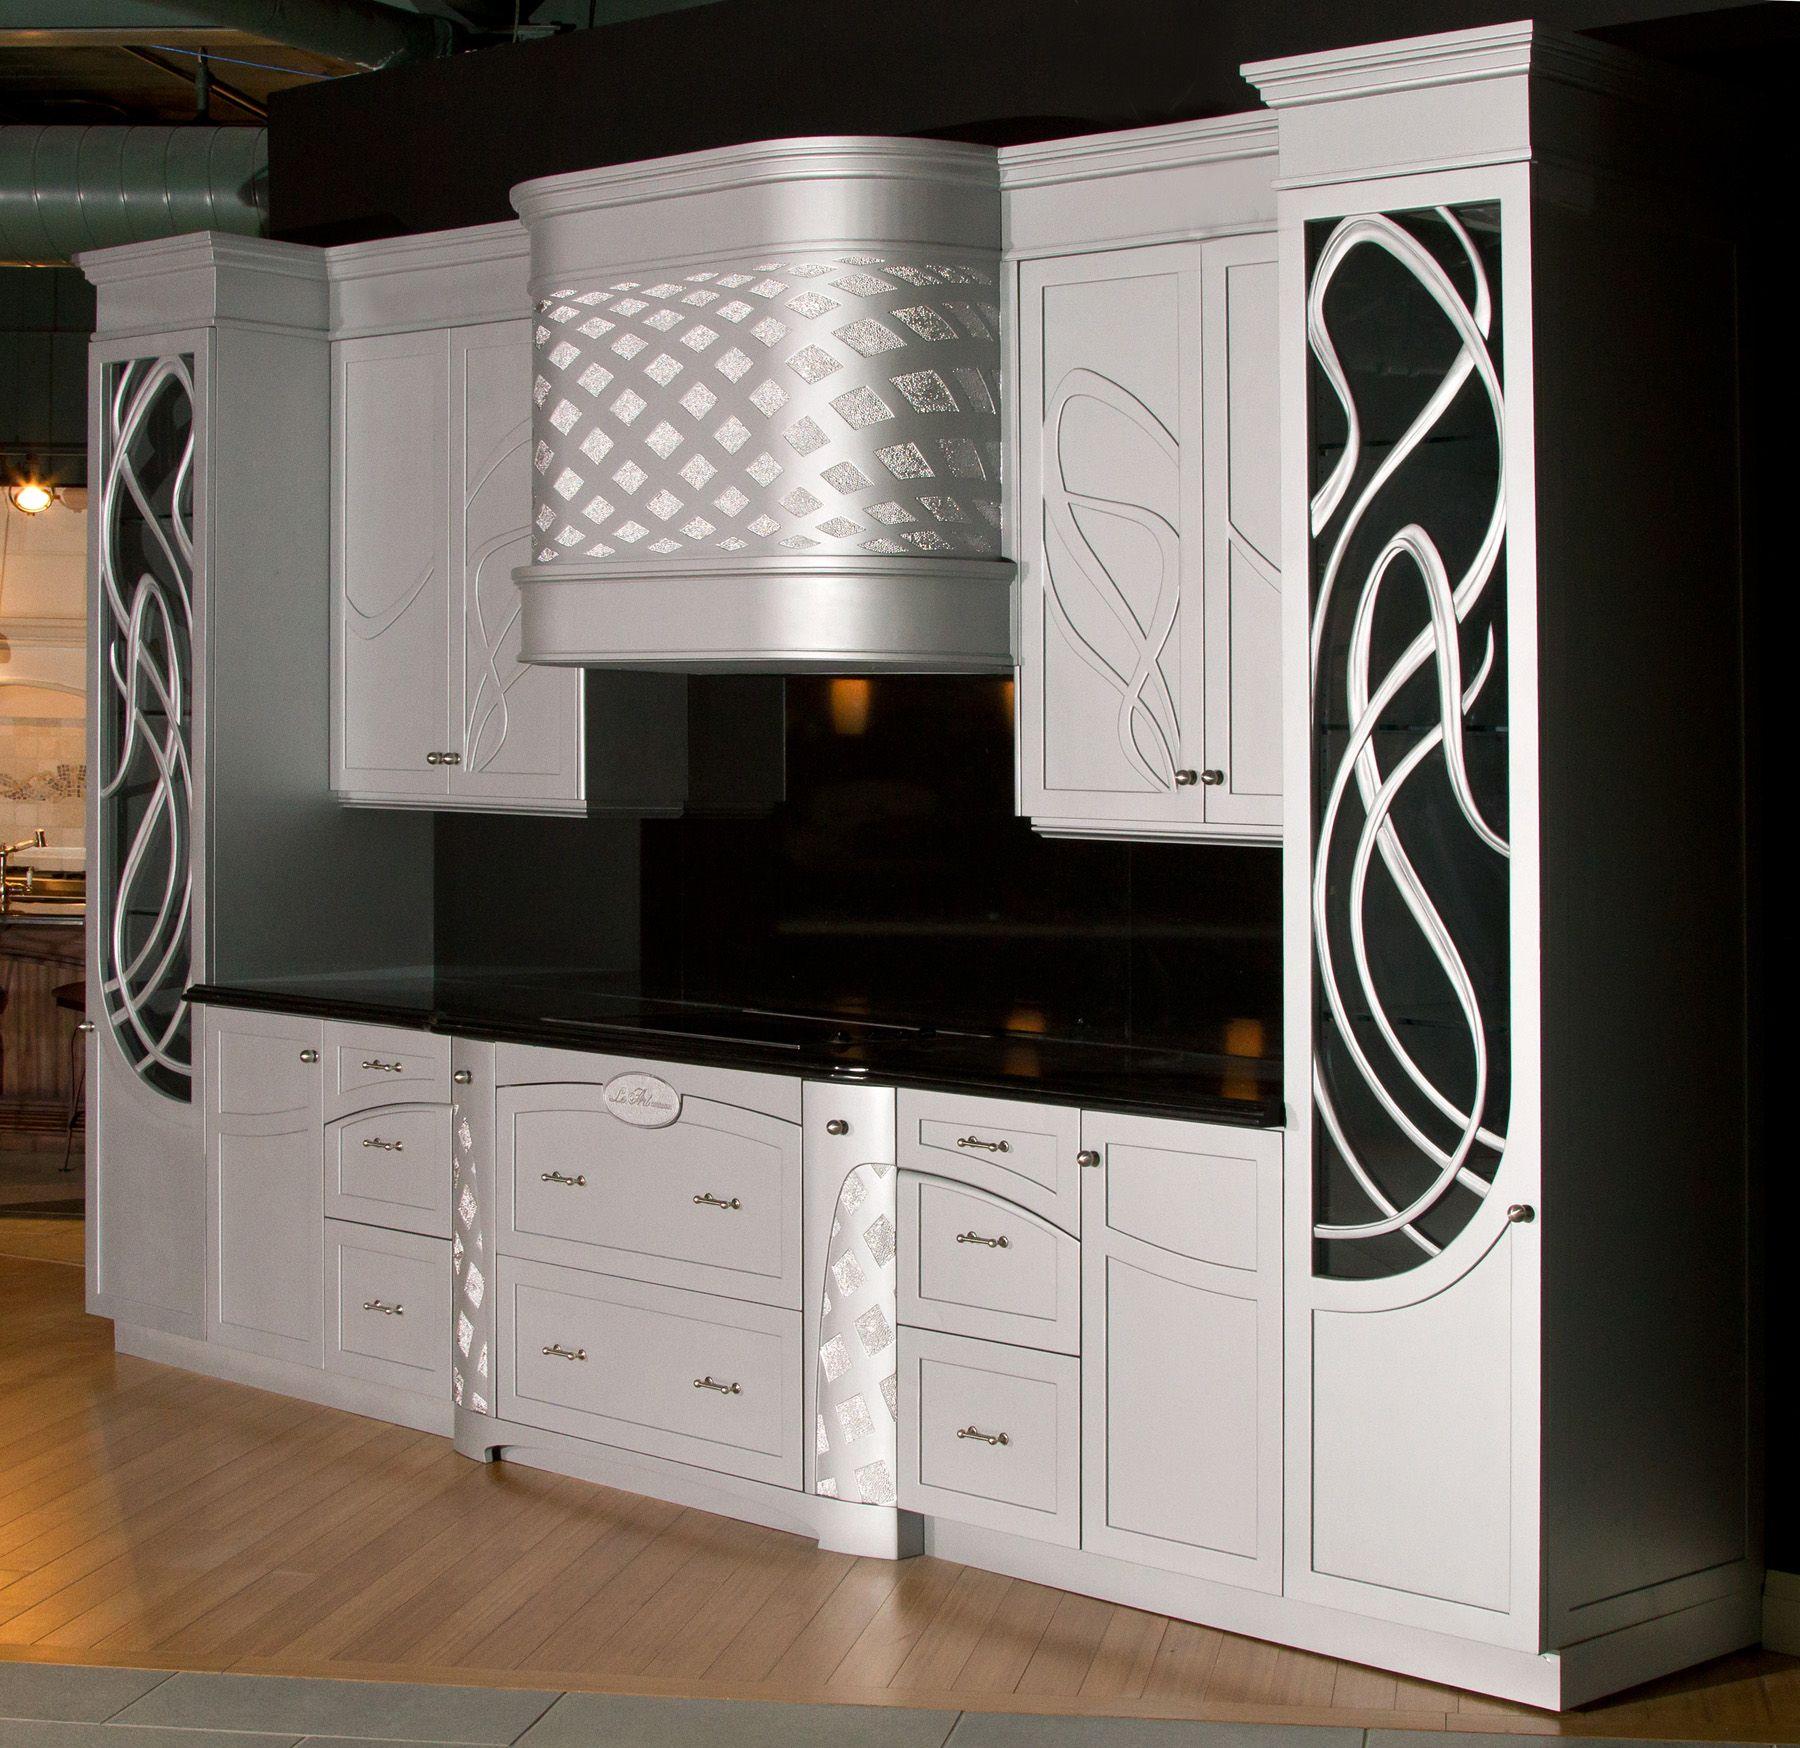 Pin By James Frager On Custom Kitchens Art Deco Kitchen Art Deco Kitchen Cabinet Art Deco Kitchen Design